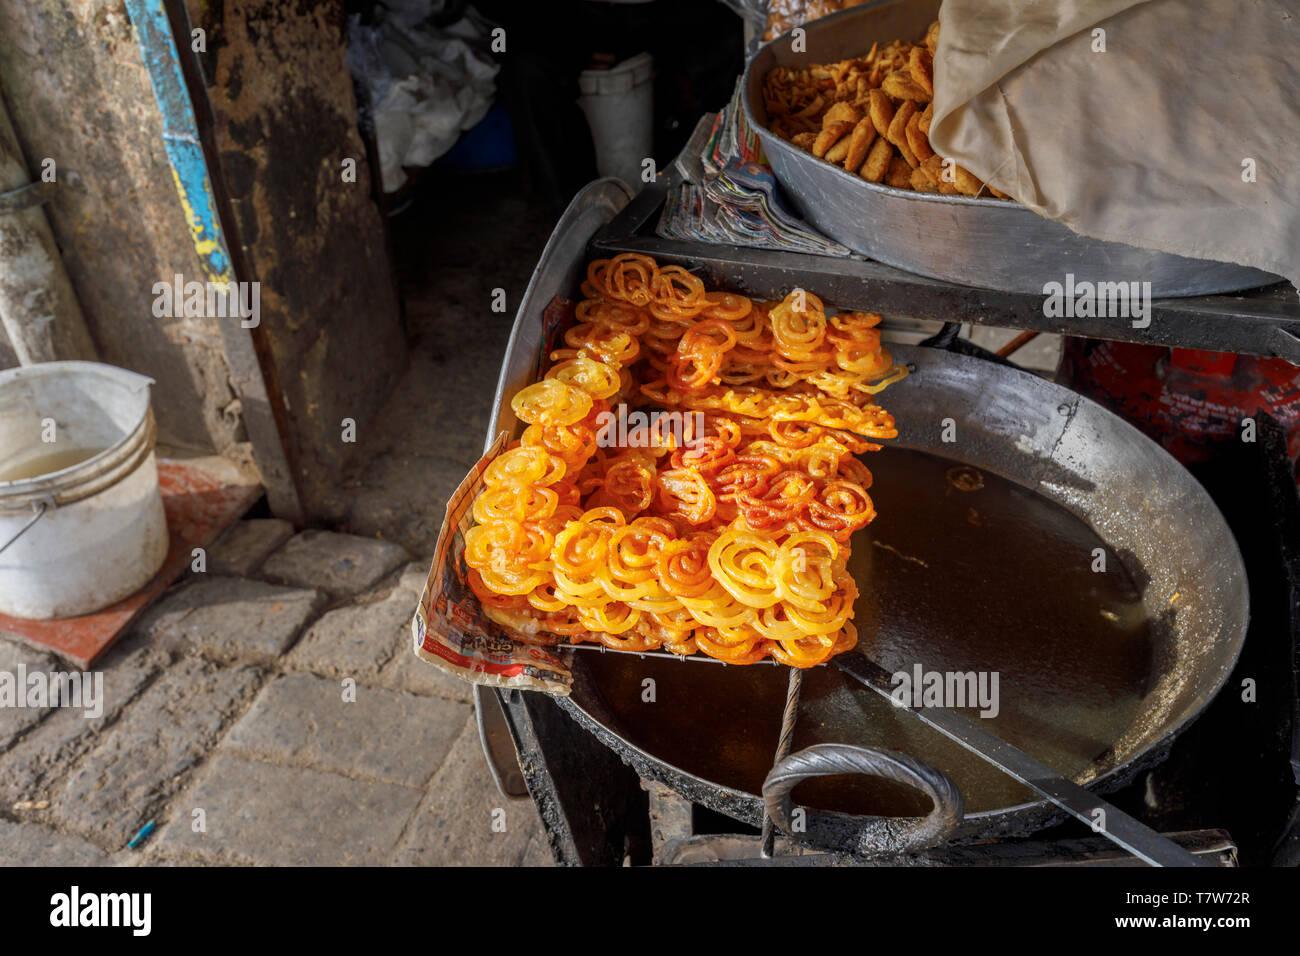 Street scene, Mahipalpur district, a suburb near Delhi Airport in New Delhi, capital of India: Indian sweet, crispy golden deep fried jalebi - Stock Image